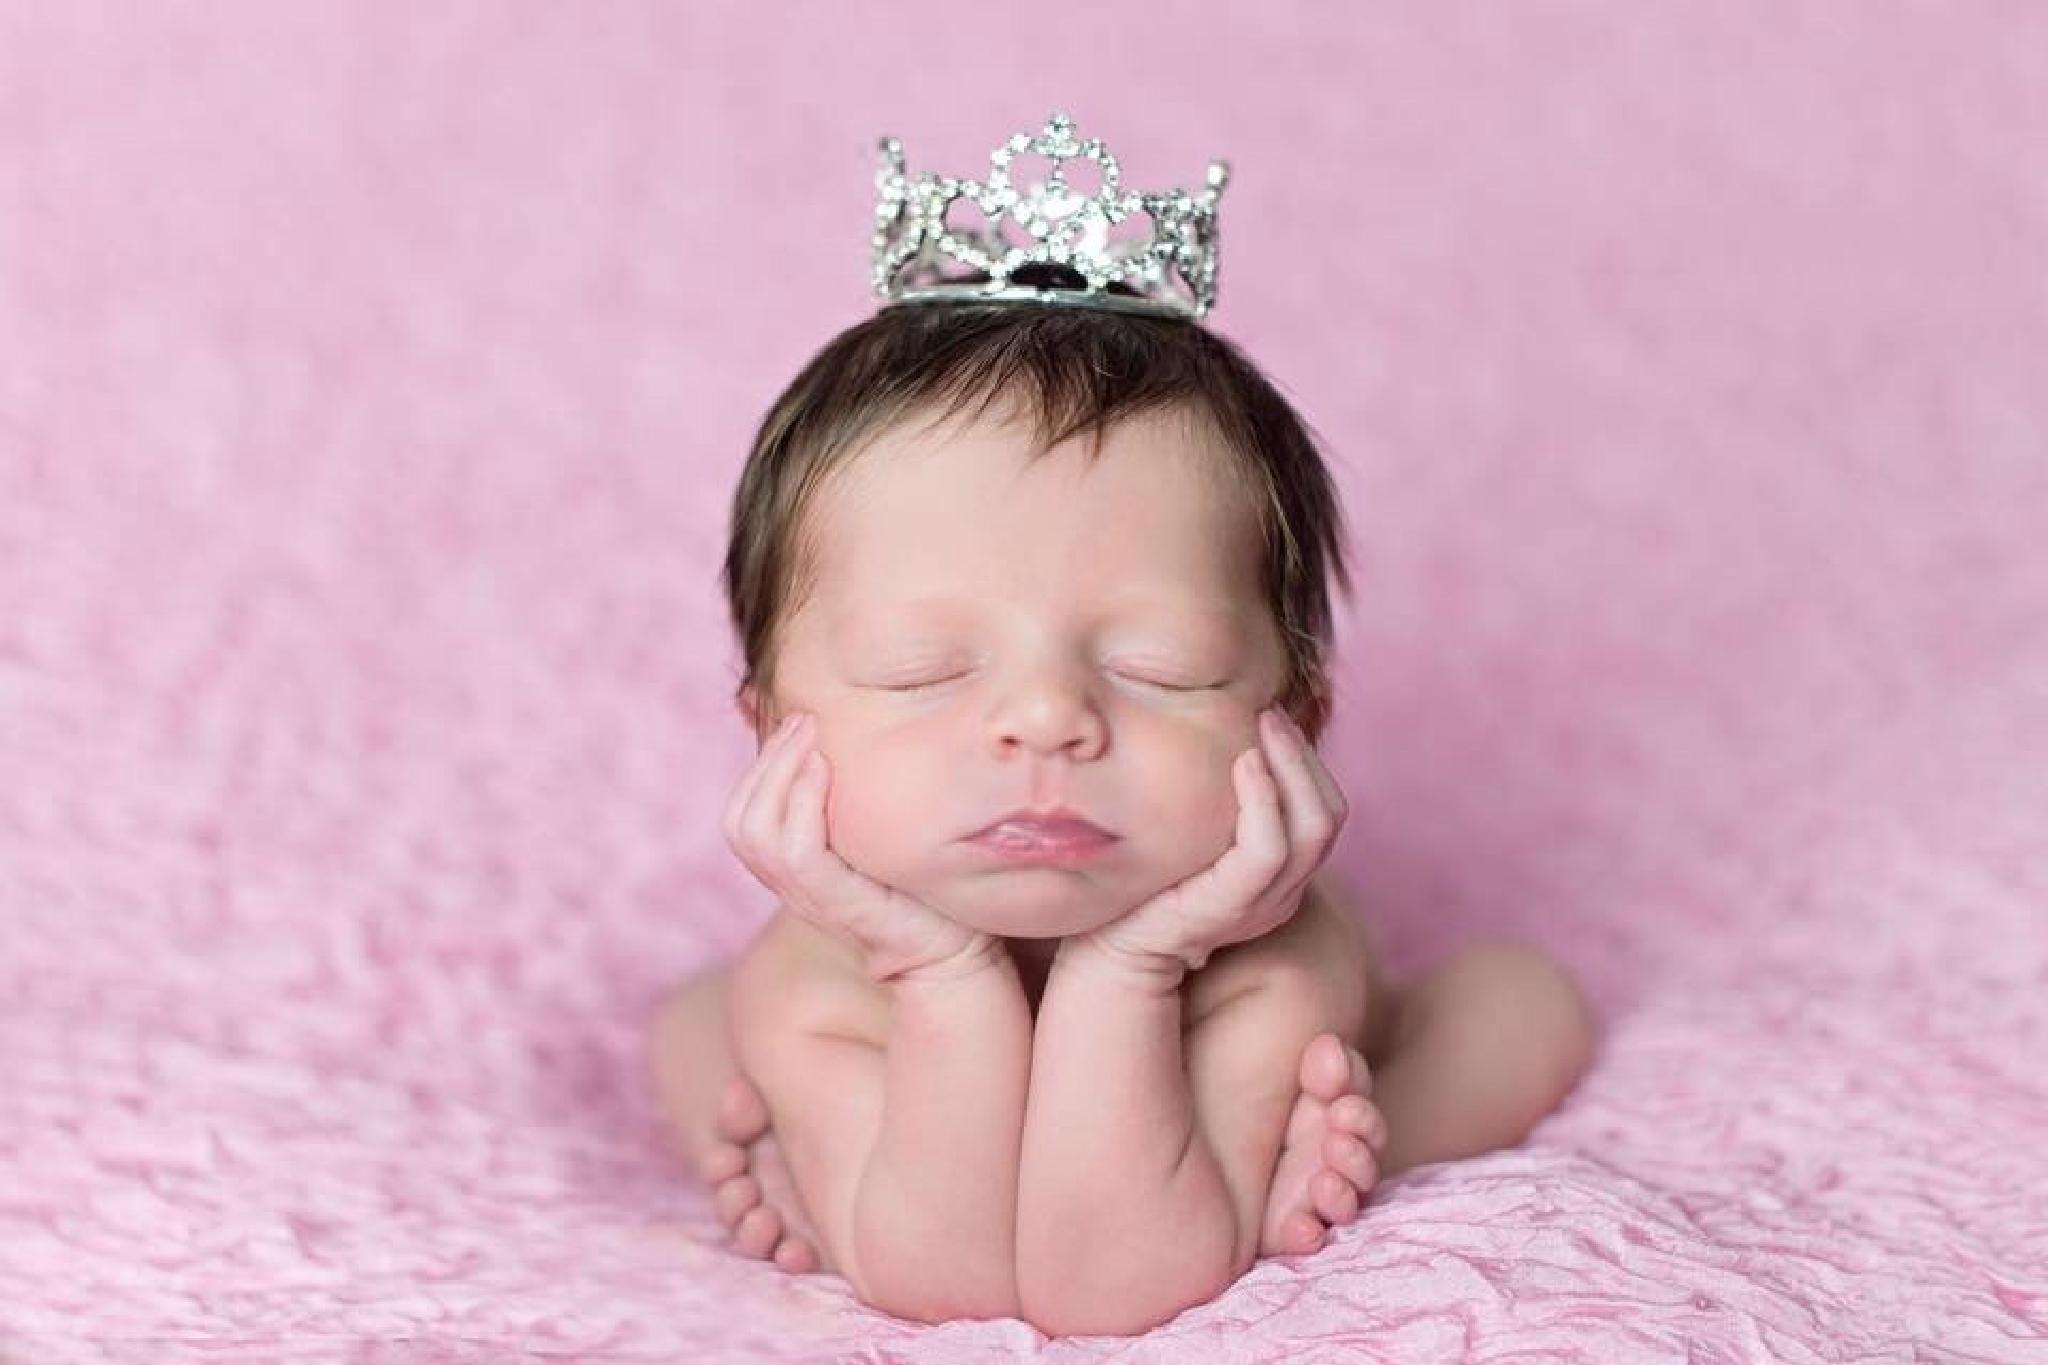 Little Princess by soulofcentralcoast